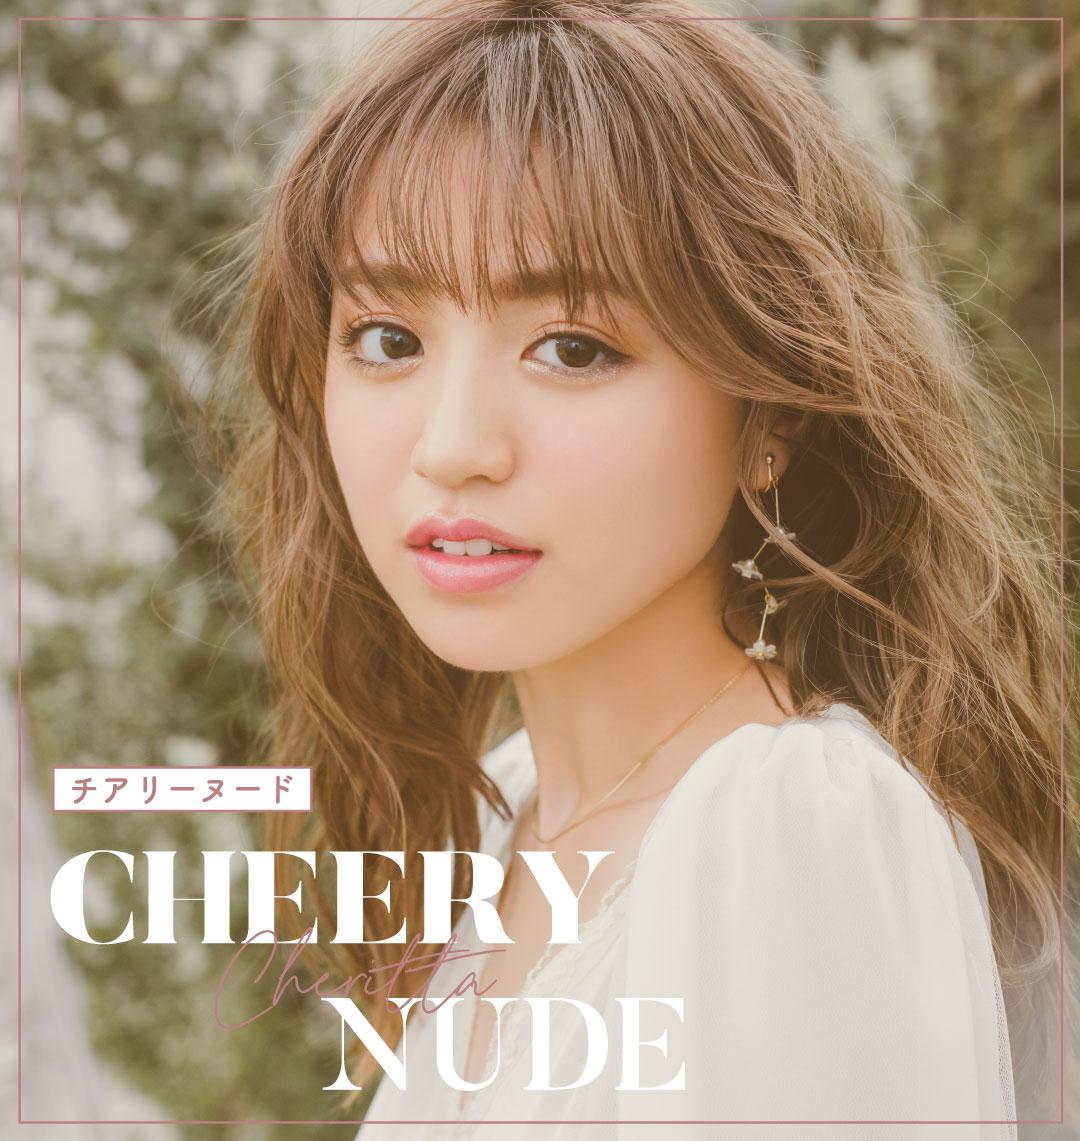 cheery nude(チアリーヌード)